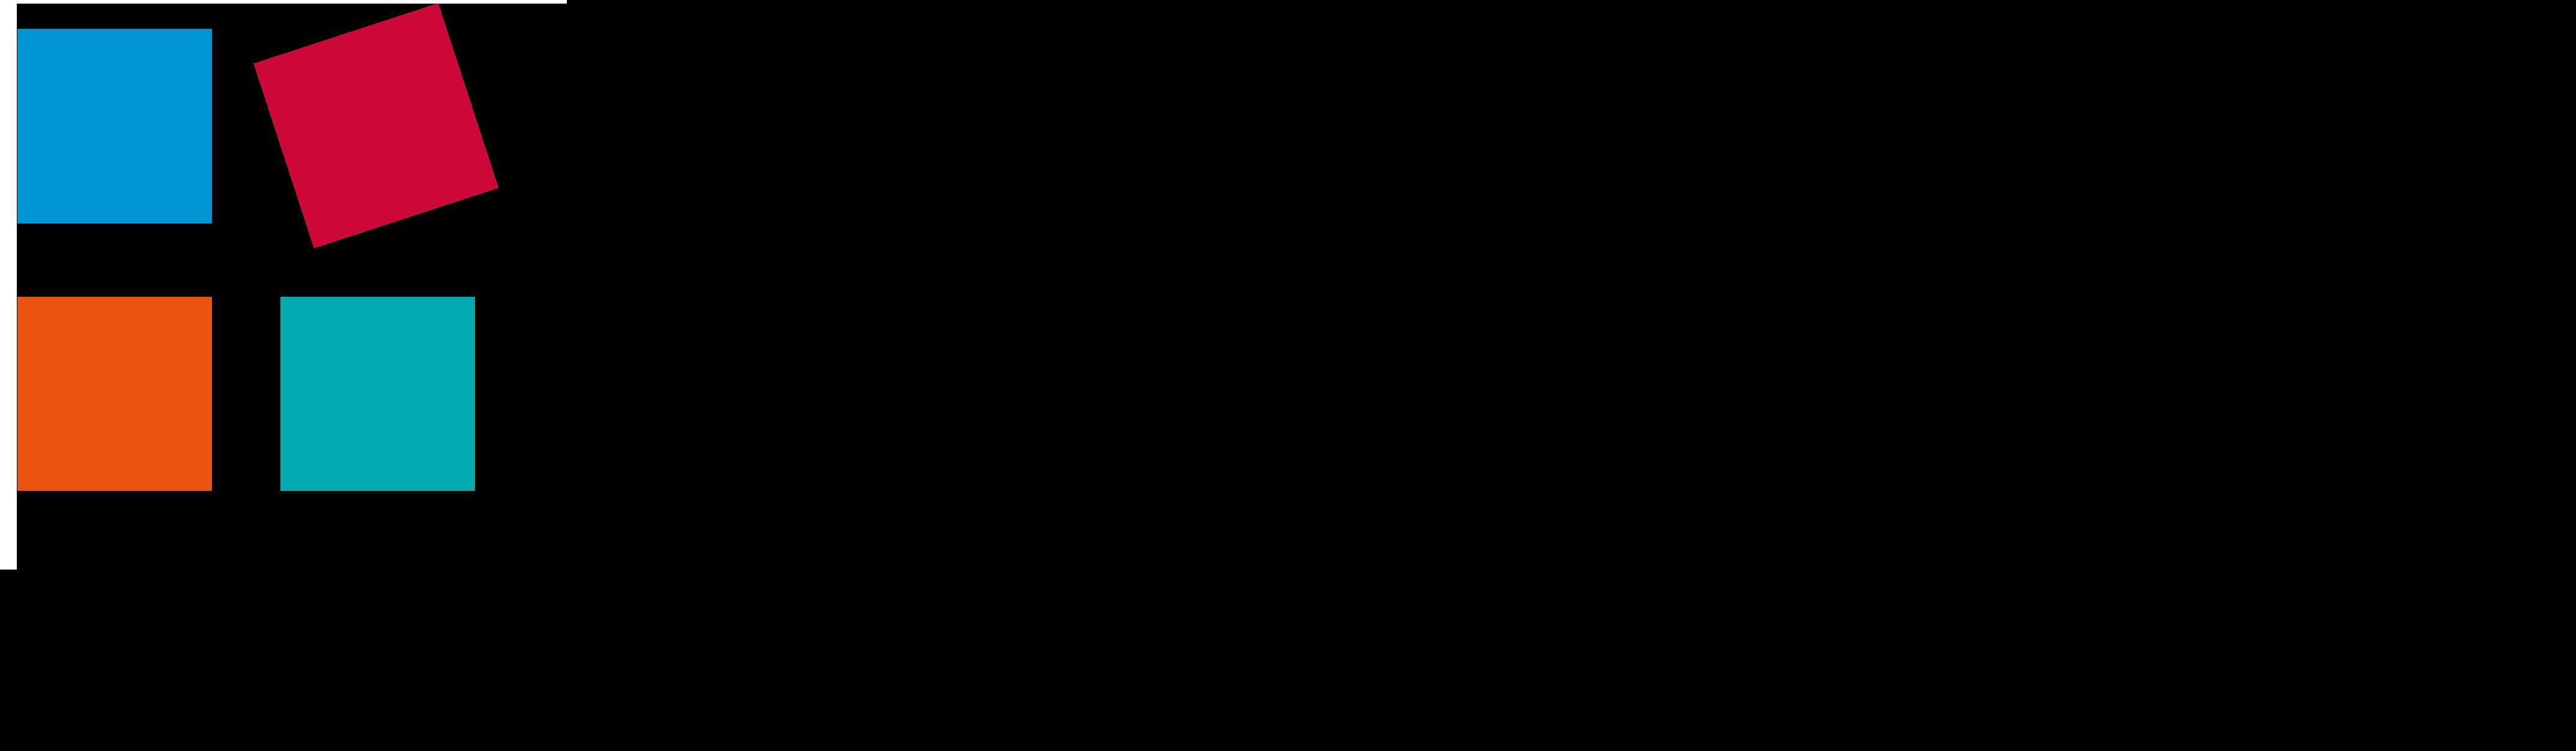 RIBOXX_Pharmaceuticals_logo_logotype.png